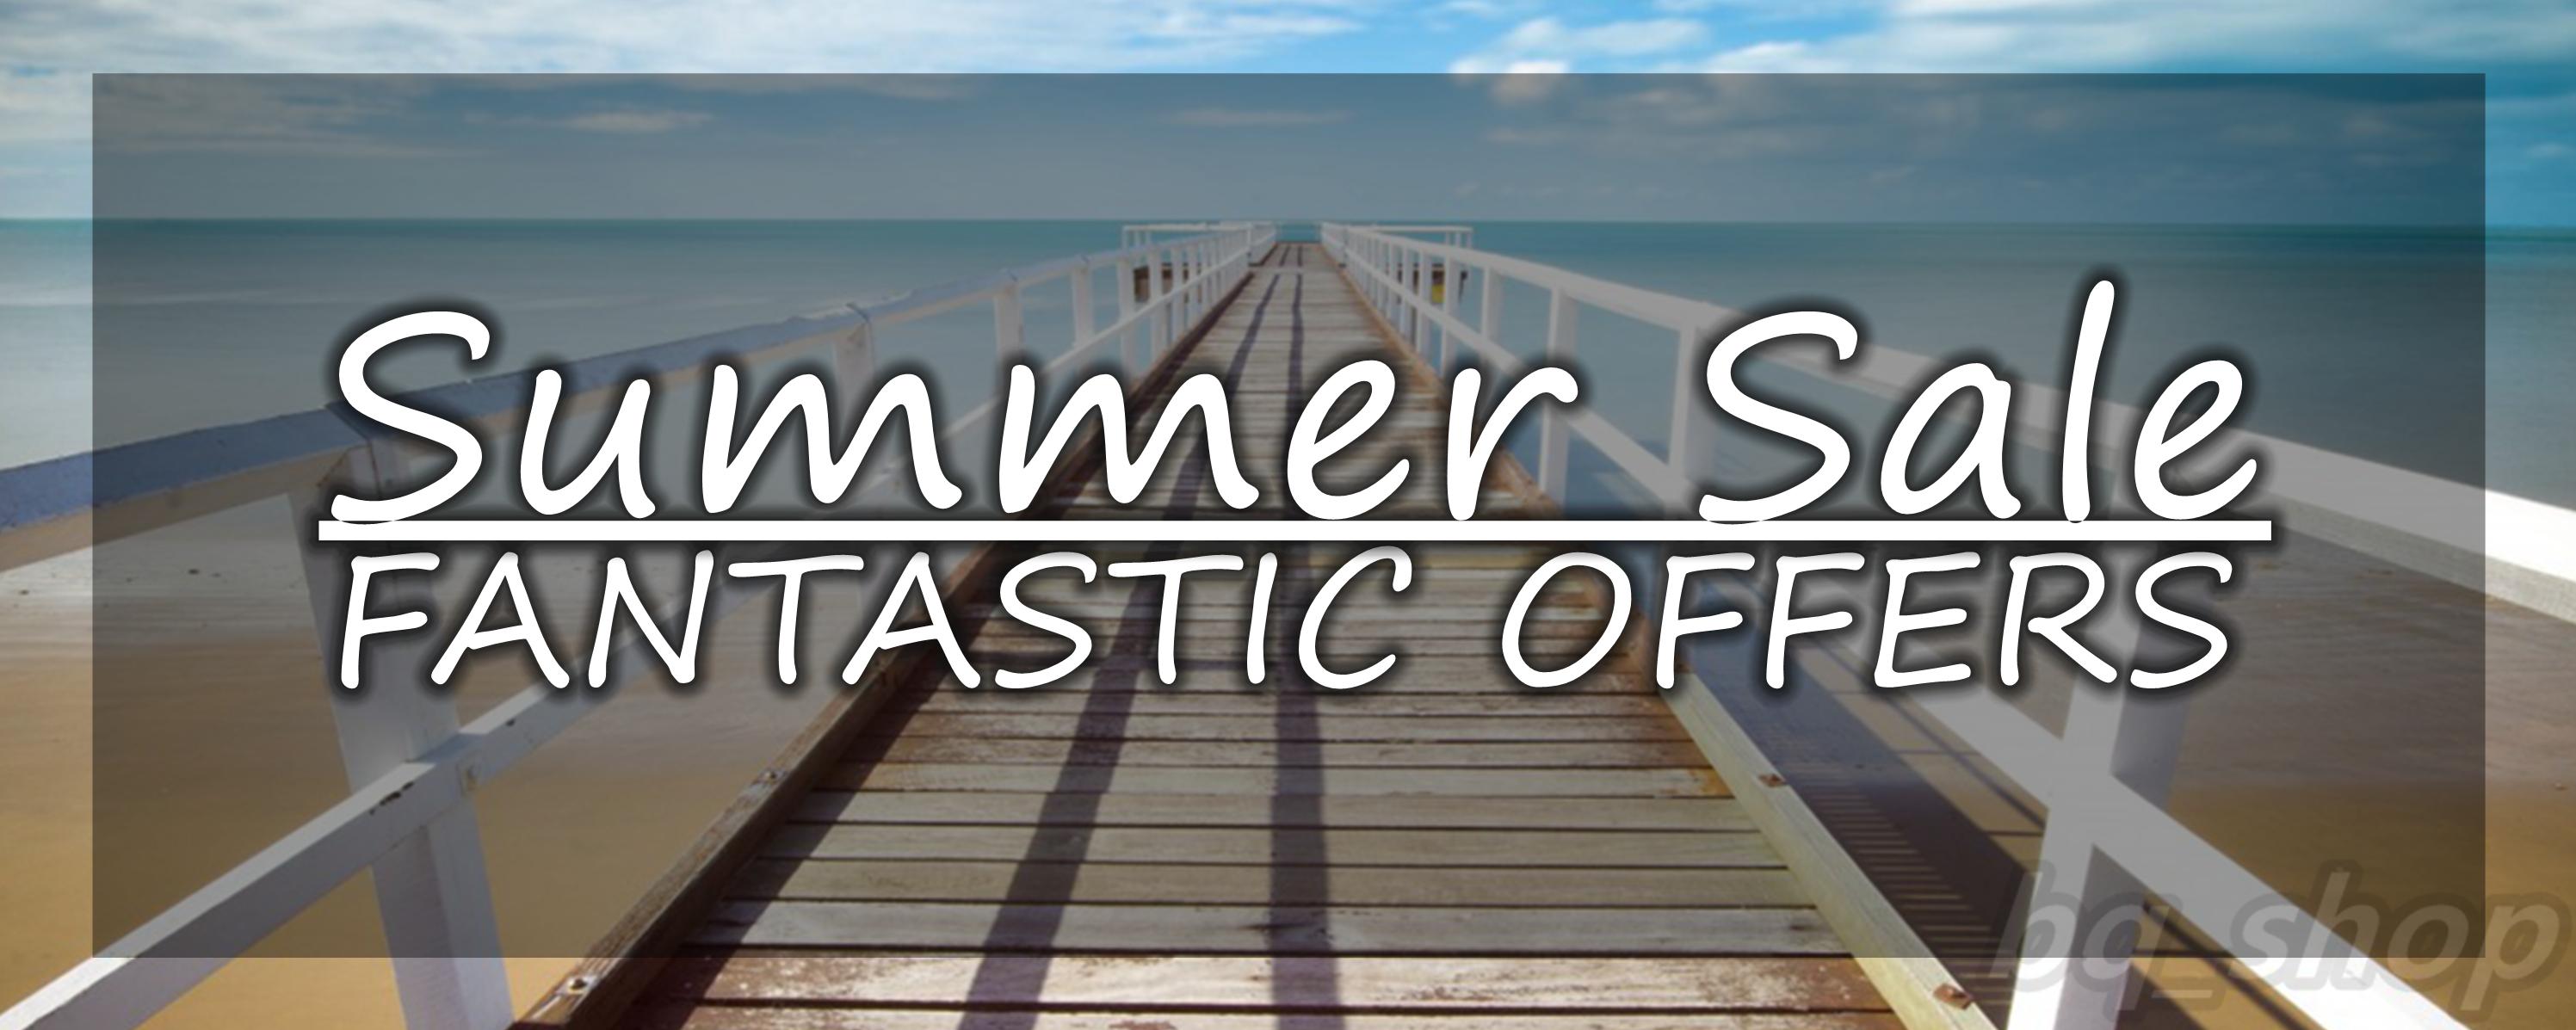 summersale-bqshopestore.com-2018.png